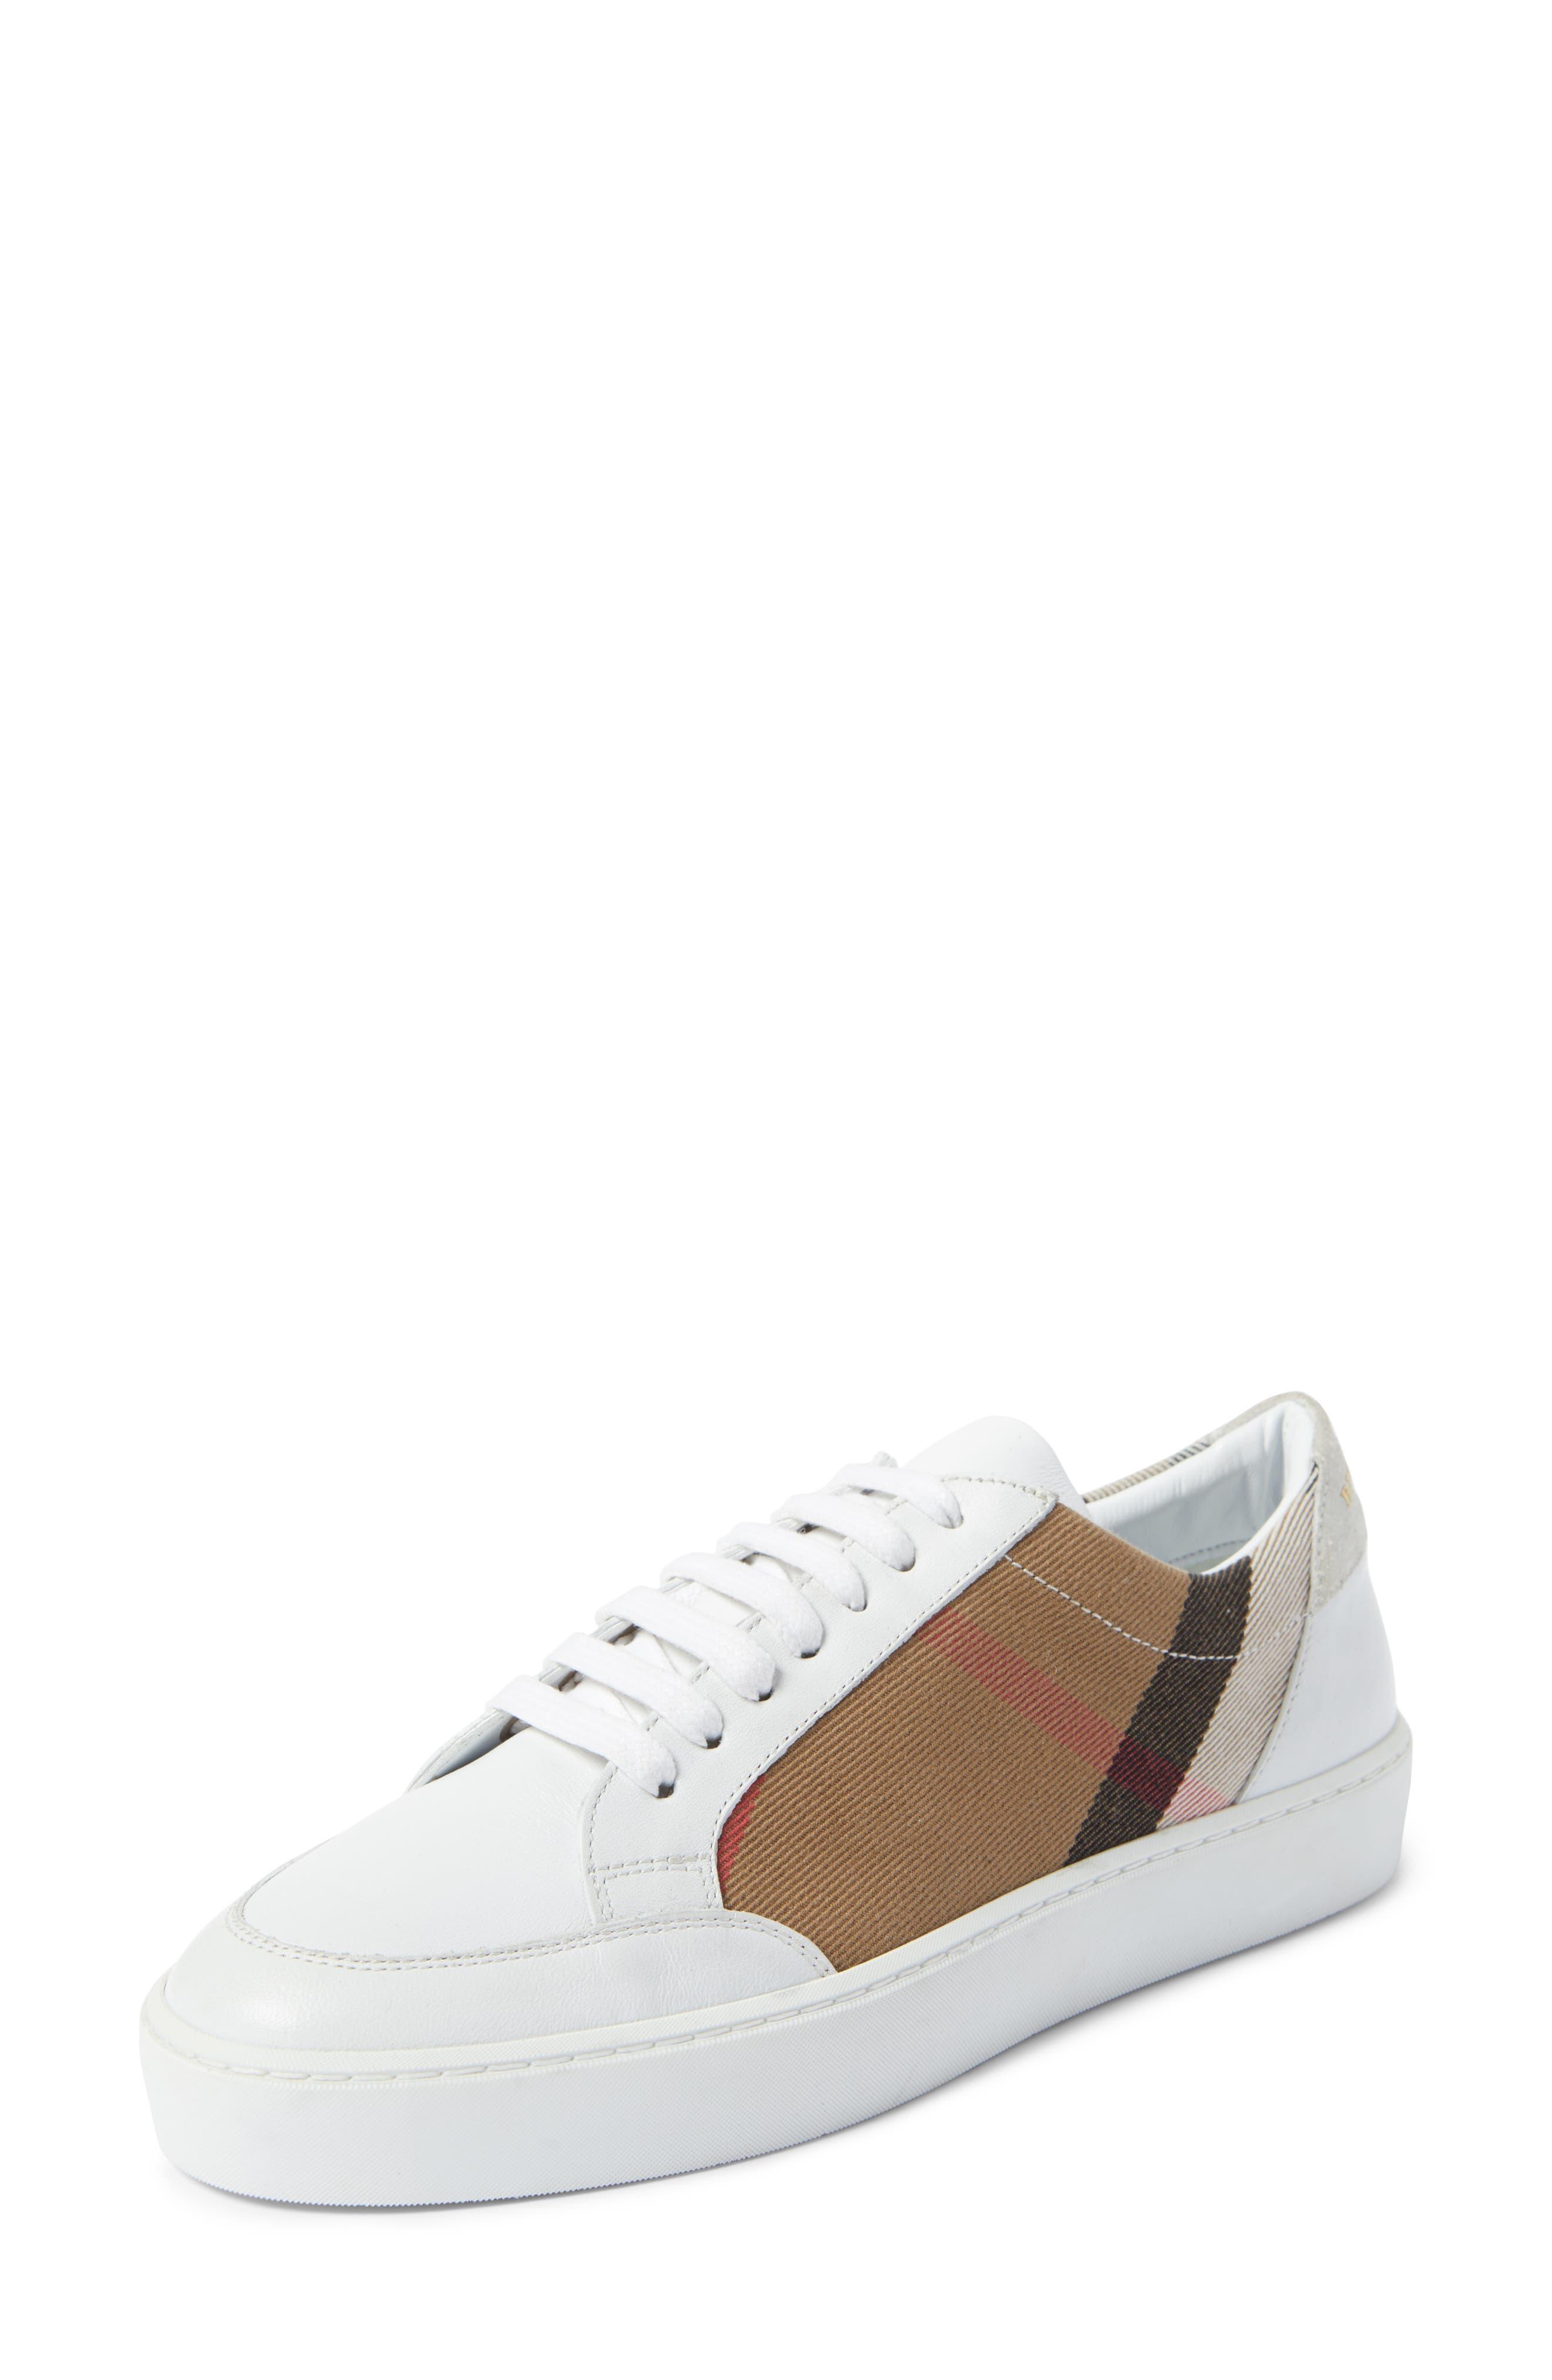 Salmond Sneaker,                             Main thumbnail 1, color,                             108